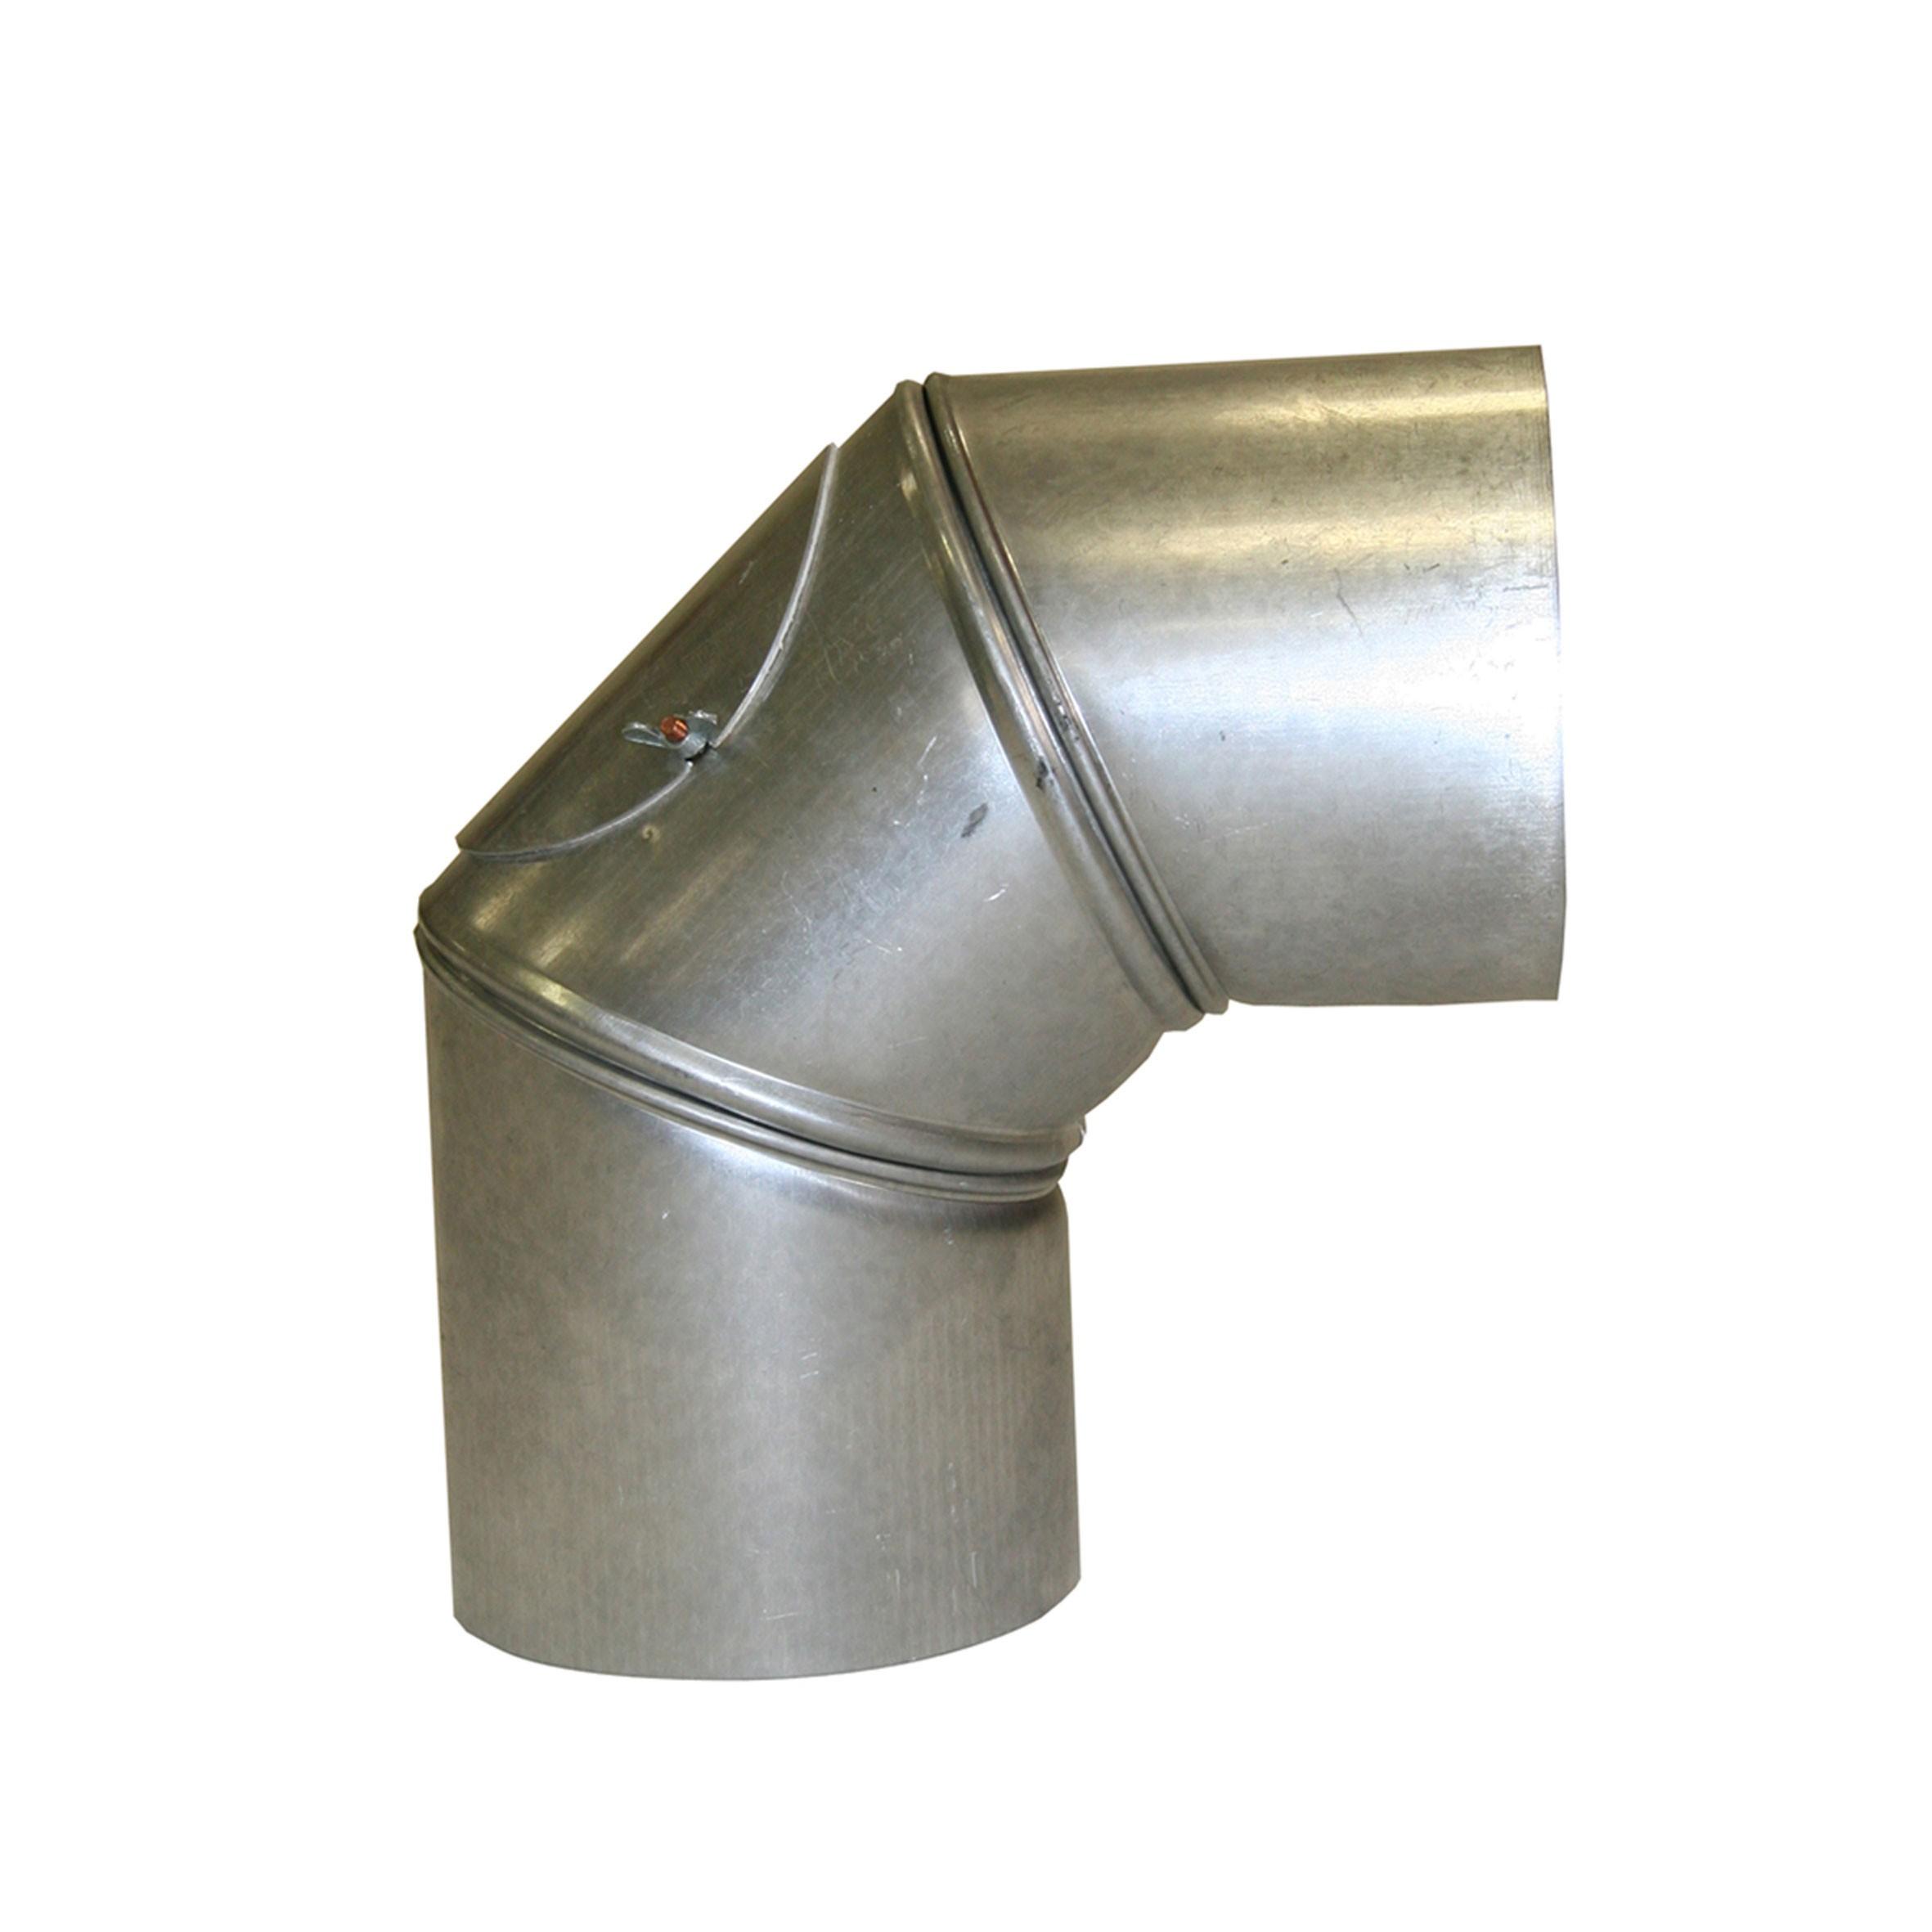 Ofenrohr / Rauchrohr KaminoFlam FAL Bogenknie 90° Ø100mm 3tlg. mit Tür Bild 1